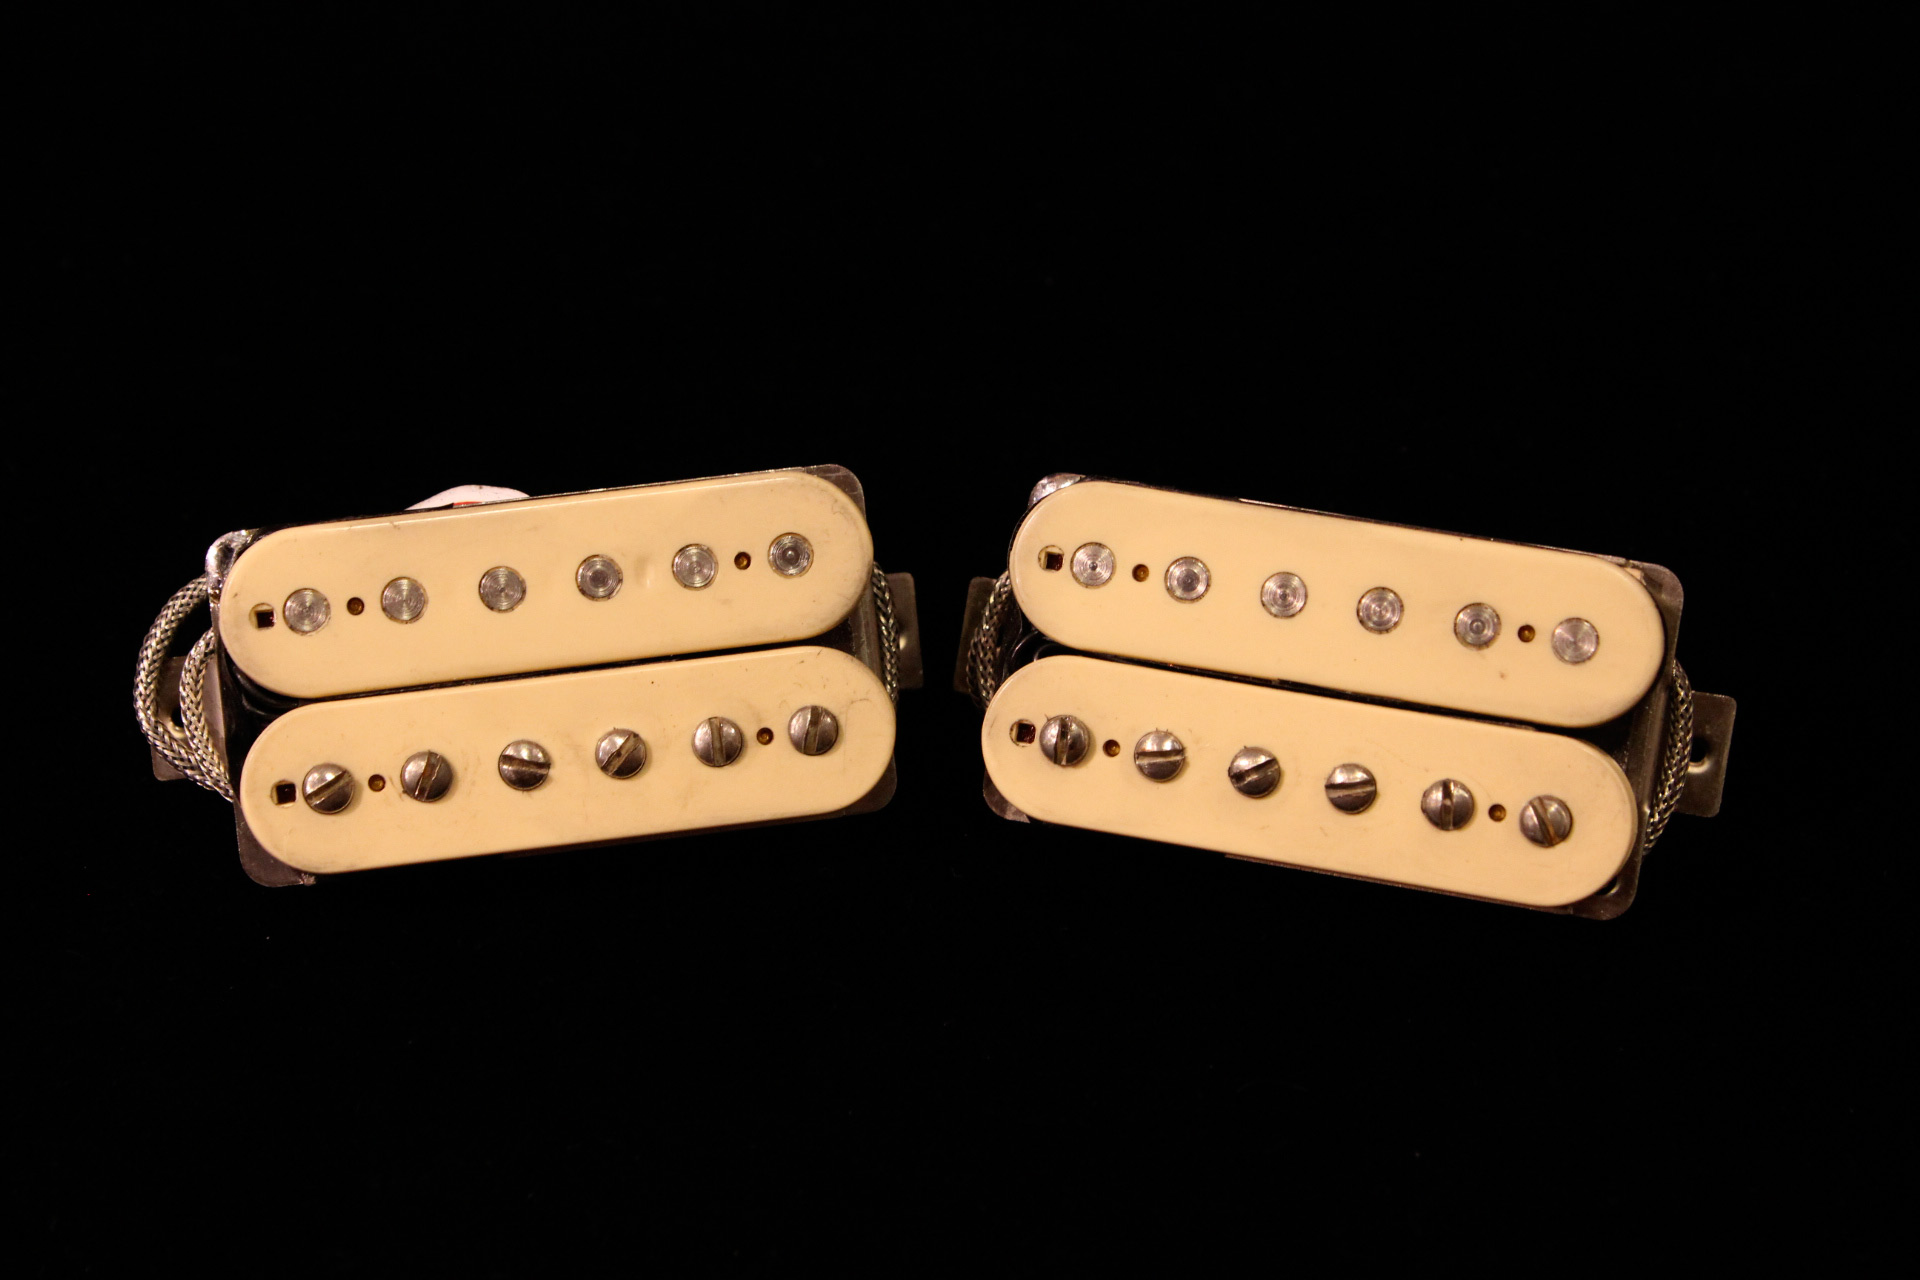 Hookup Gibson Les Paul Custom Shop